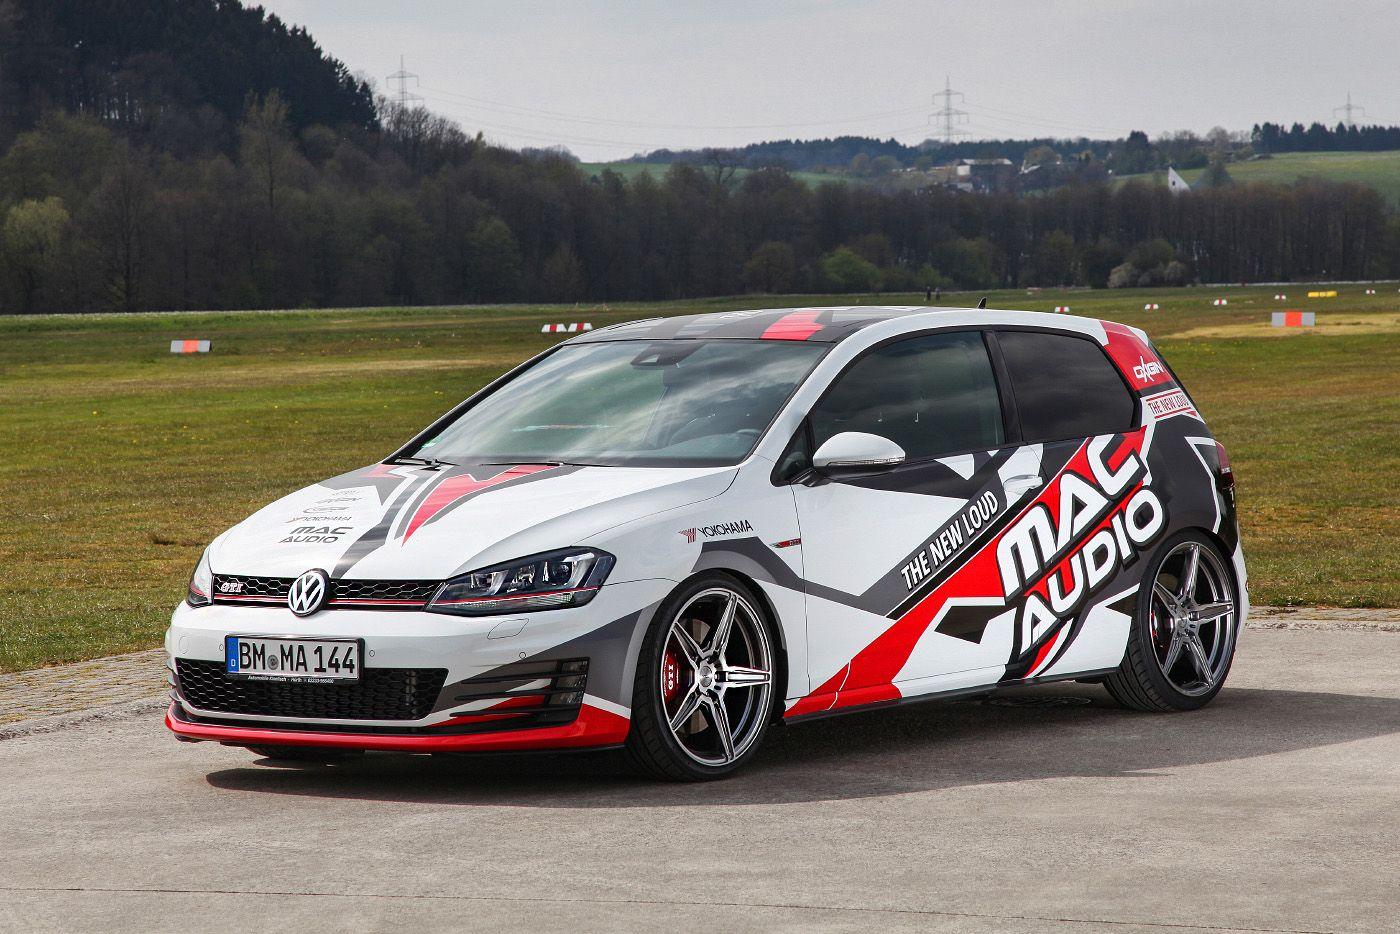 Golf GTI 7 Performance for Mac Audio | Sight Auto. Graphics ...